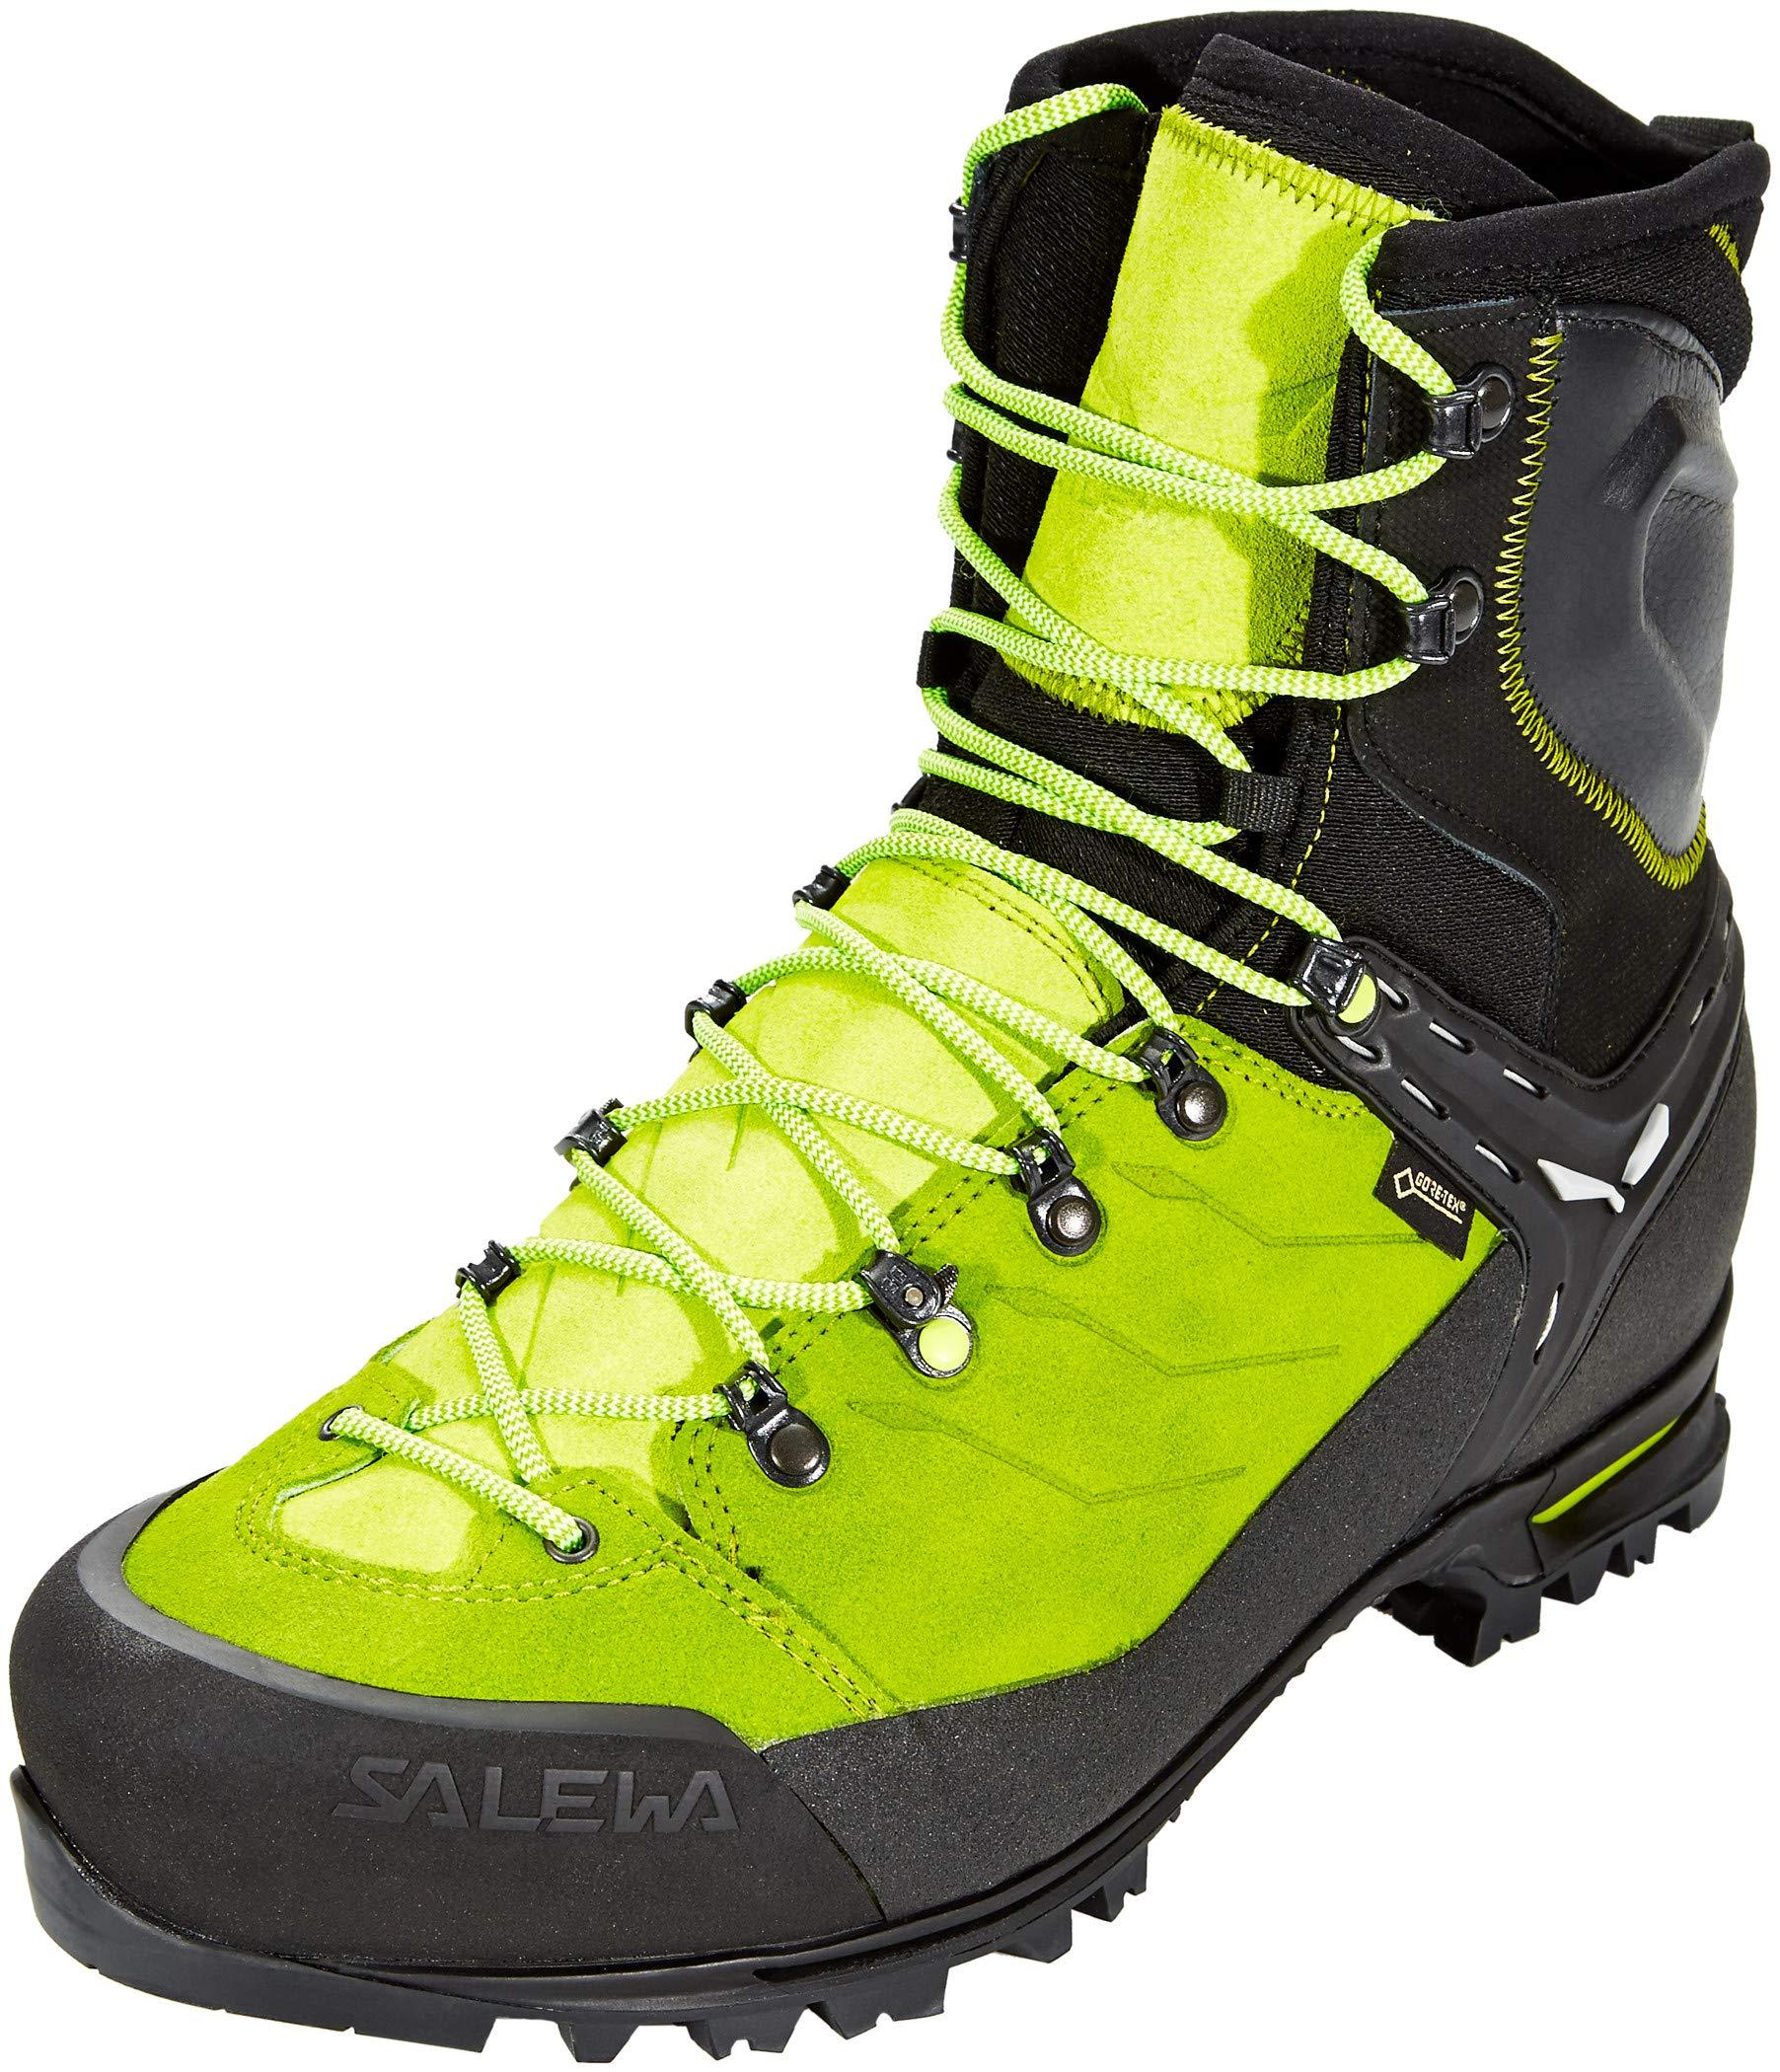 Salewa Men's Vultur EVO GTX Mountaineering Boots Black/Cactus 9.5 by Salewa